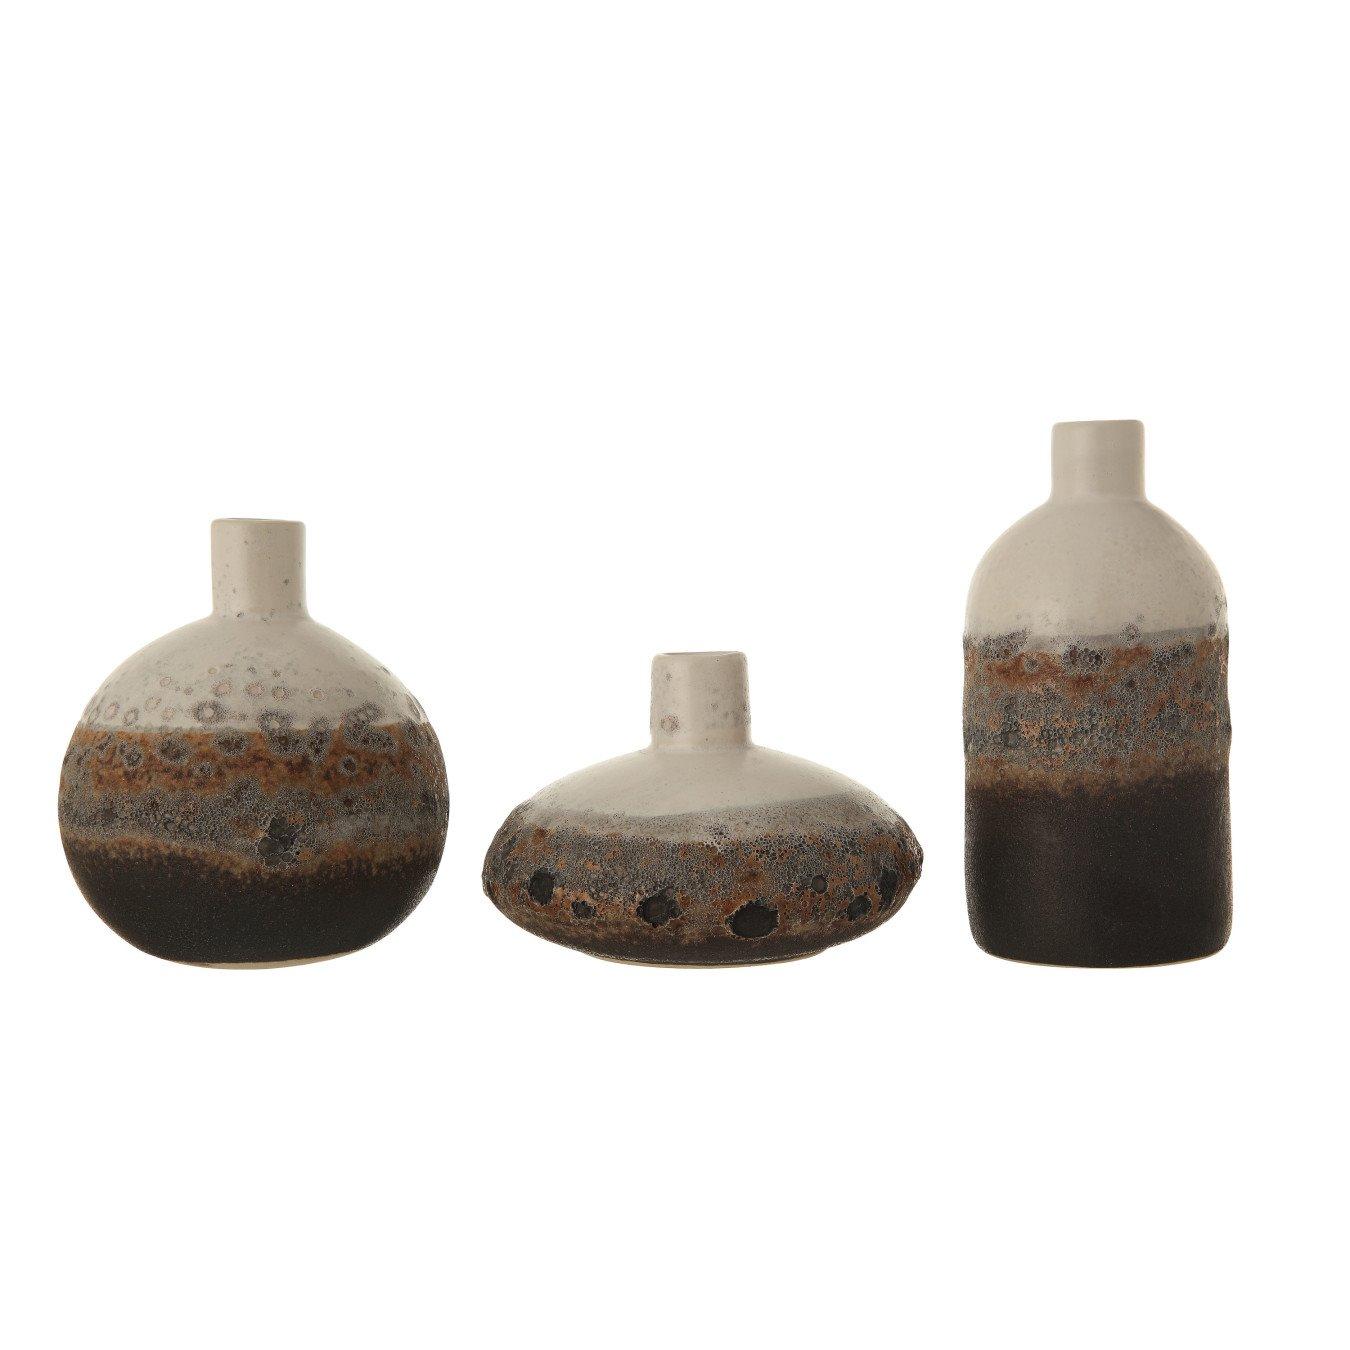 Textured Brown & White Stoneware Vase with Ombre Reactive Glaze Finish (Set of 3 Sizes)